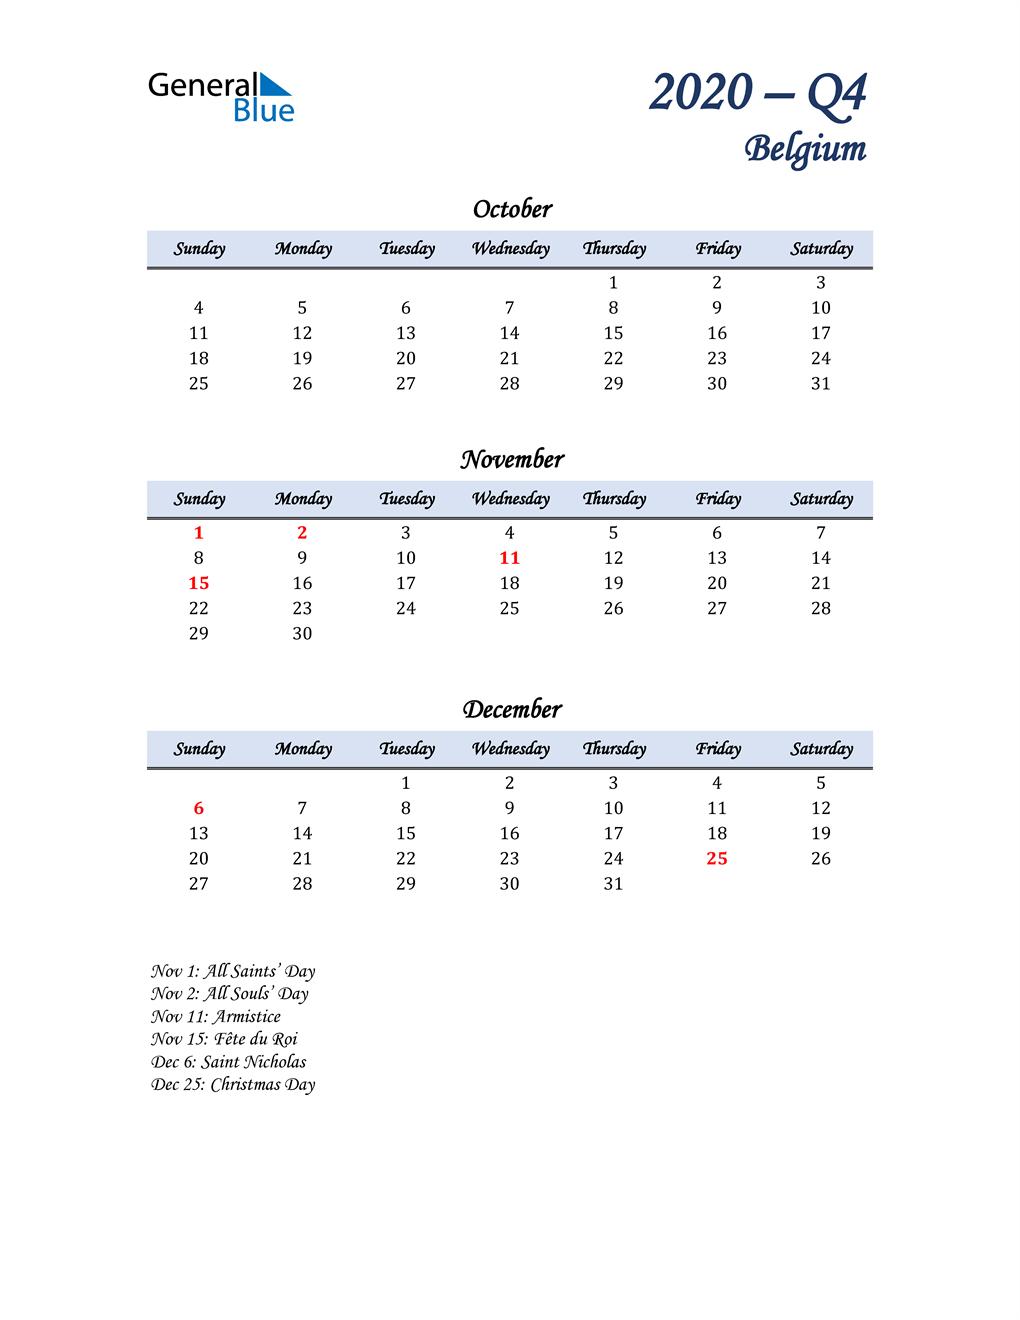 October, November, and December Calendar for Belgium